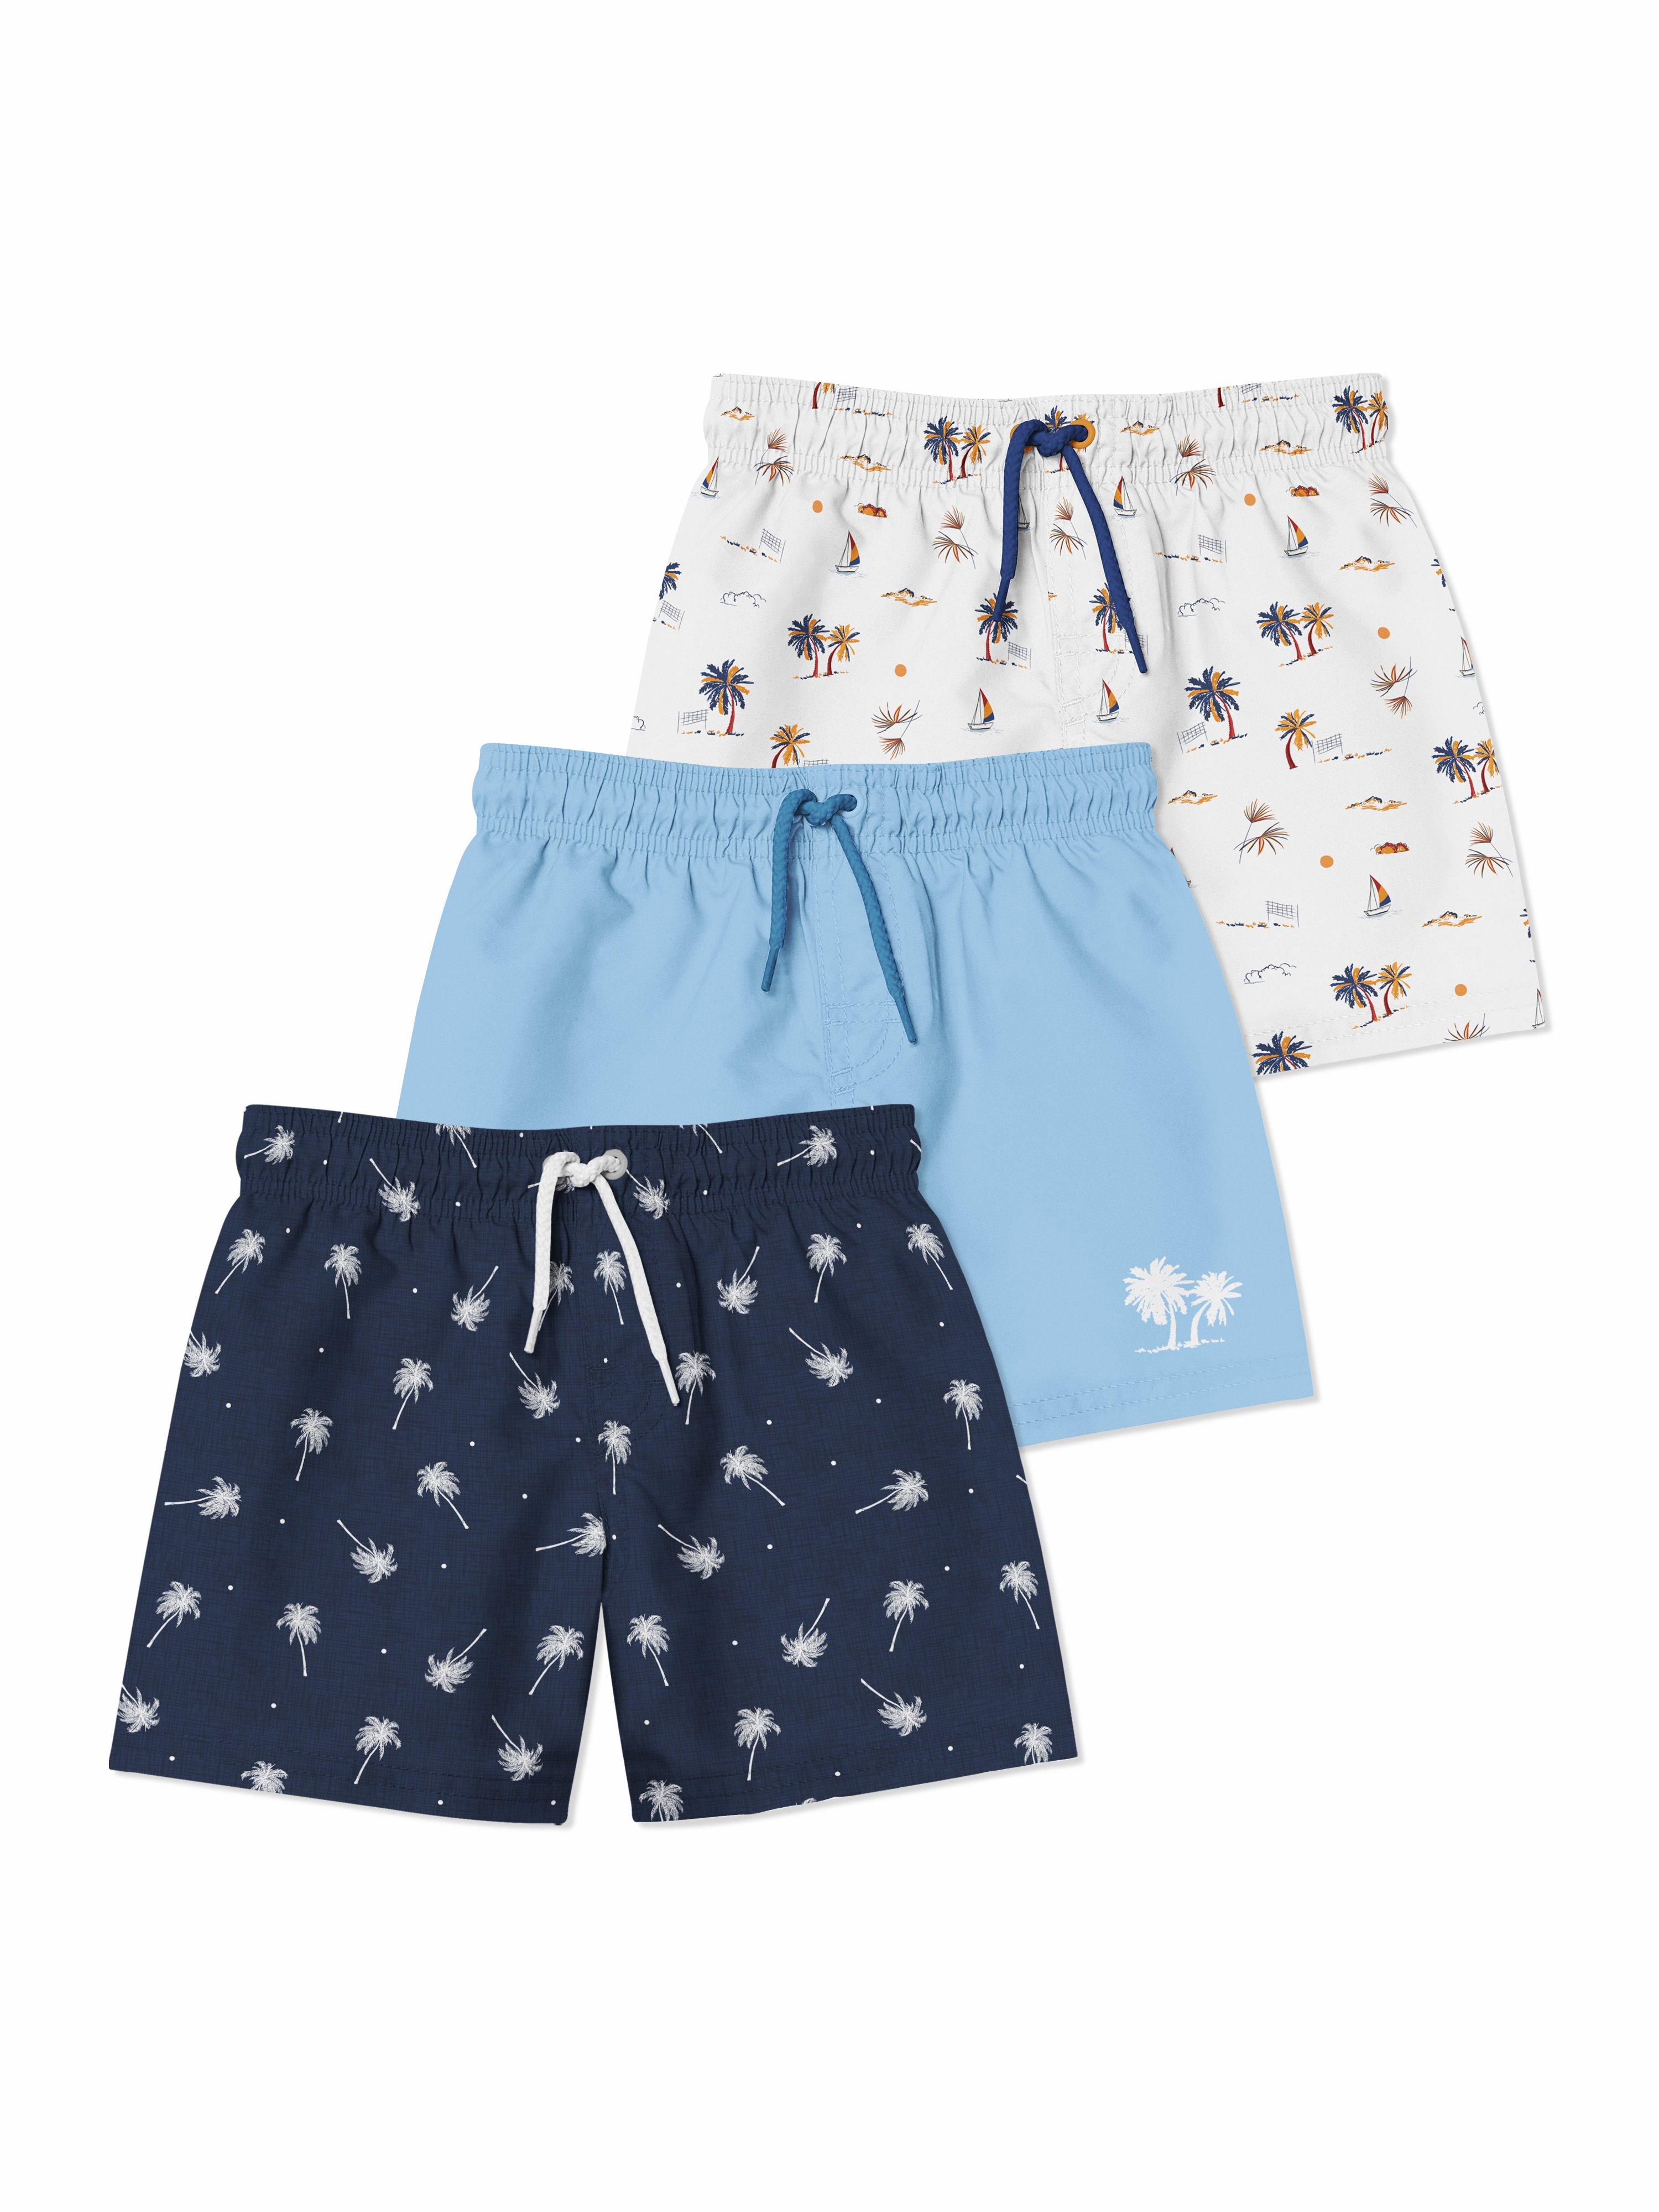 婴儿游泳短裤裤衩印花图案设计展示样机套装 Baby Swimming Shorts Mockups Set插图(6)